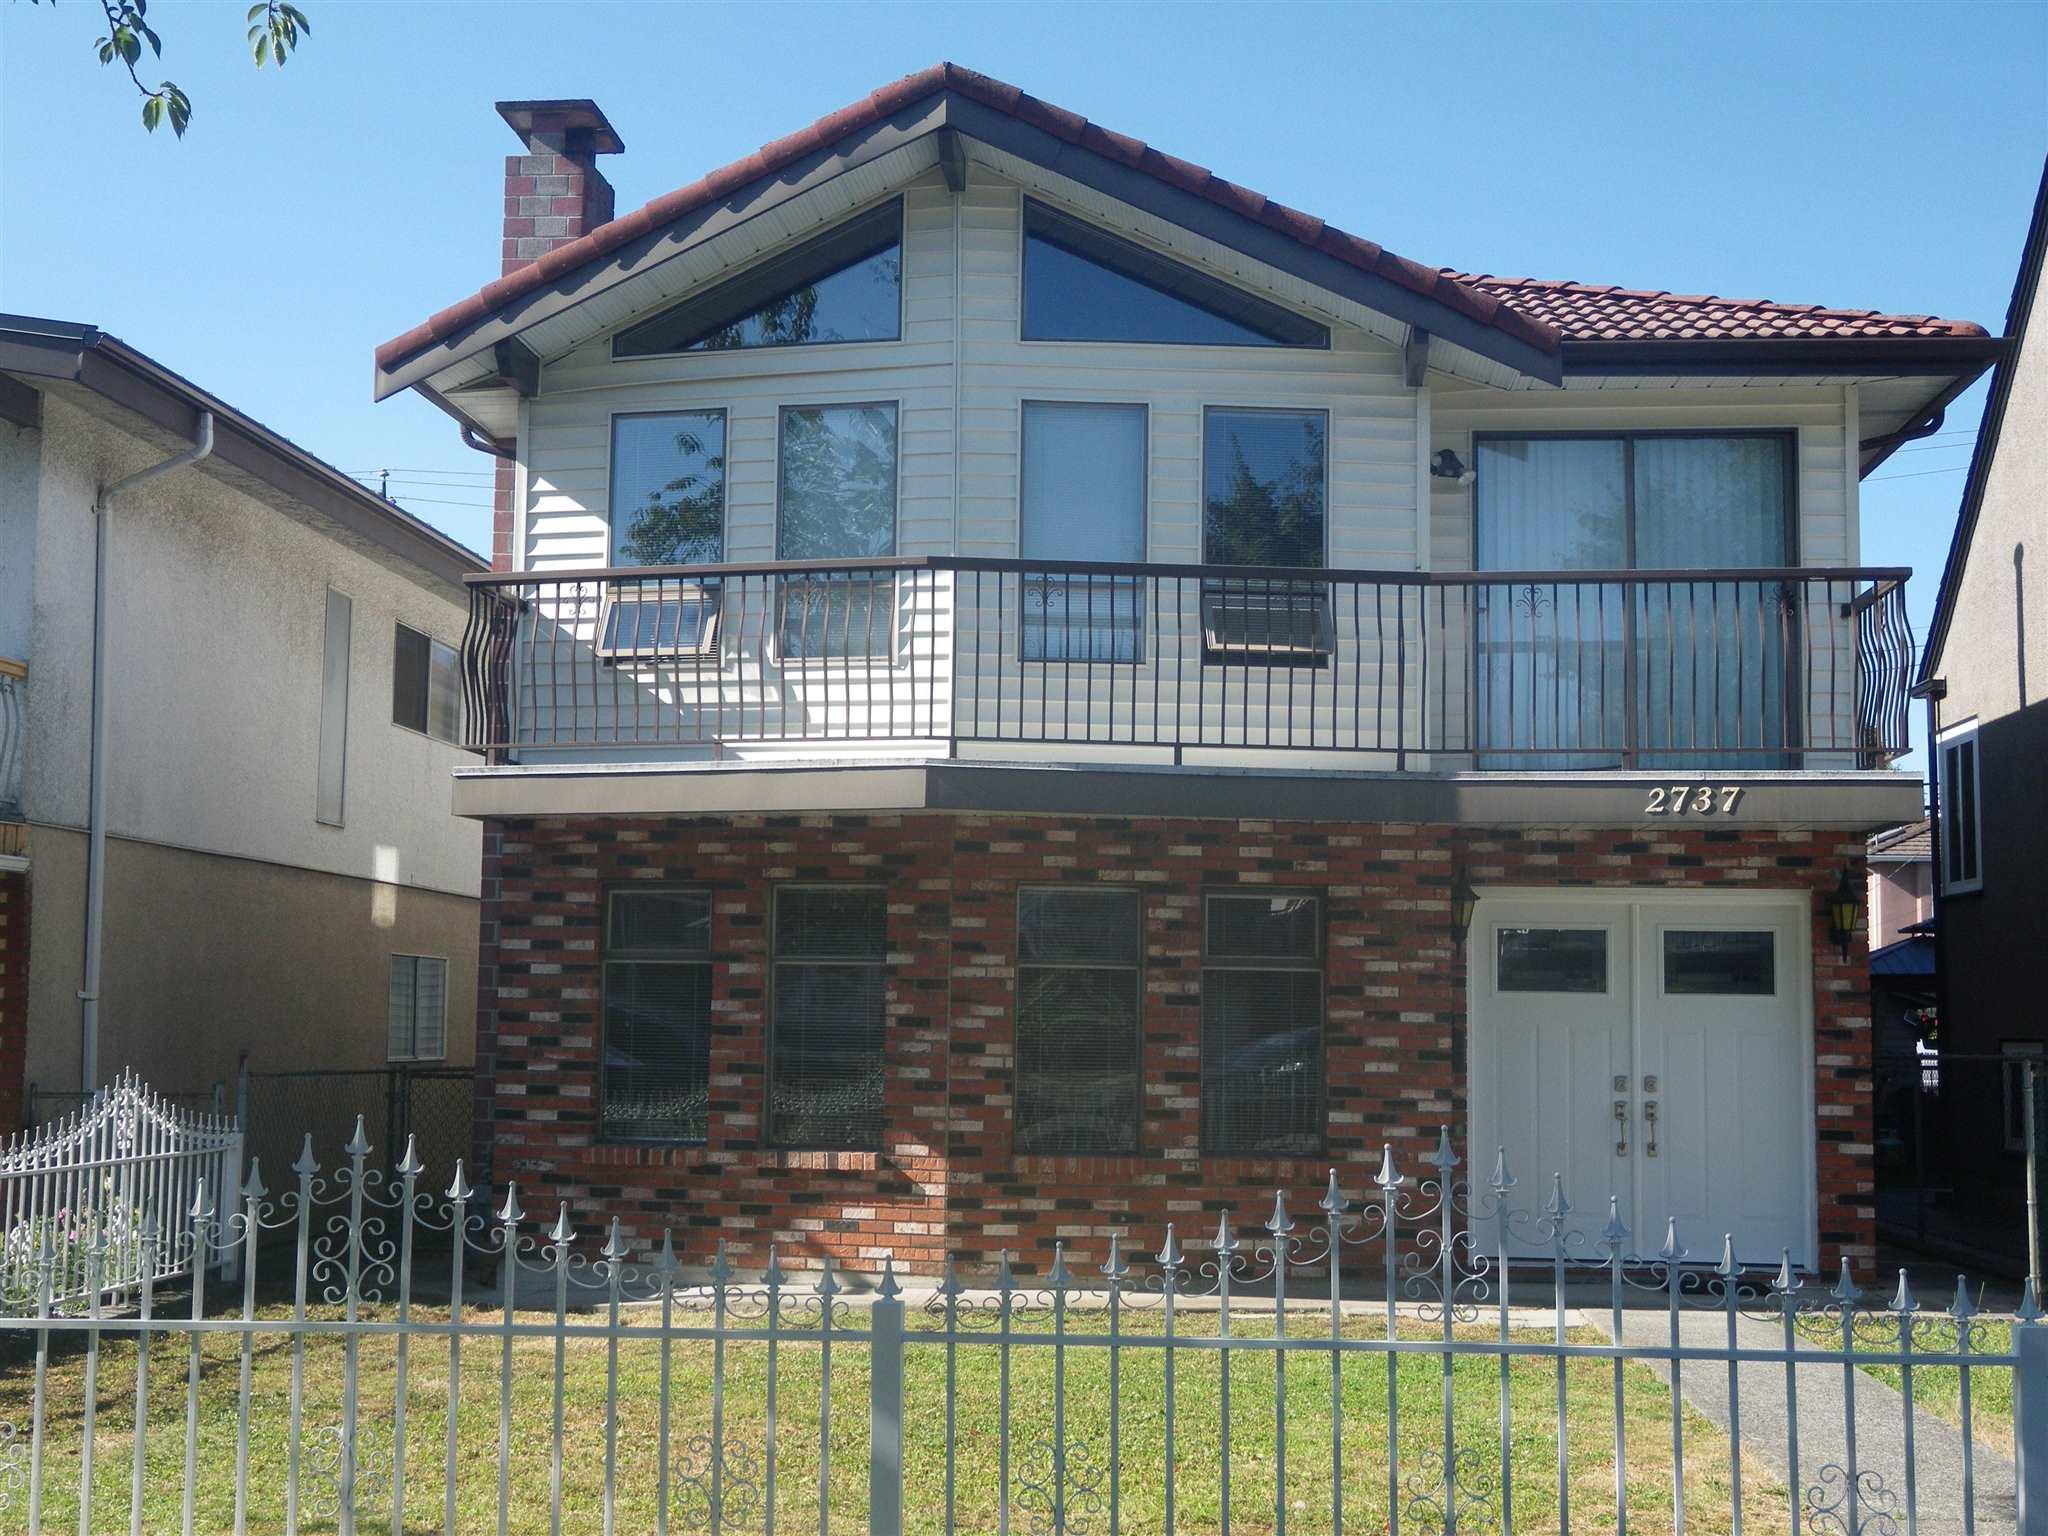 2737 E 2ND AVENUE - Renfrew VE House/Single Family for sale, 5 Bedrooms (R2603551) - #1